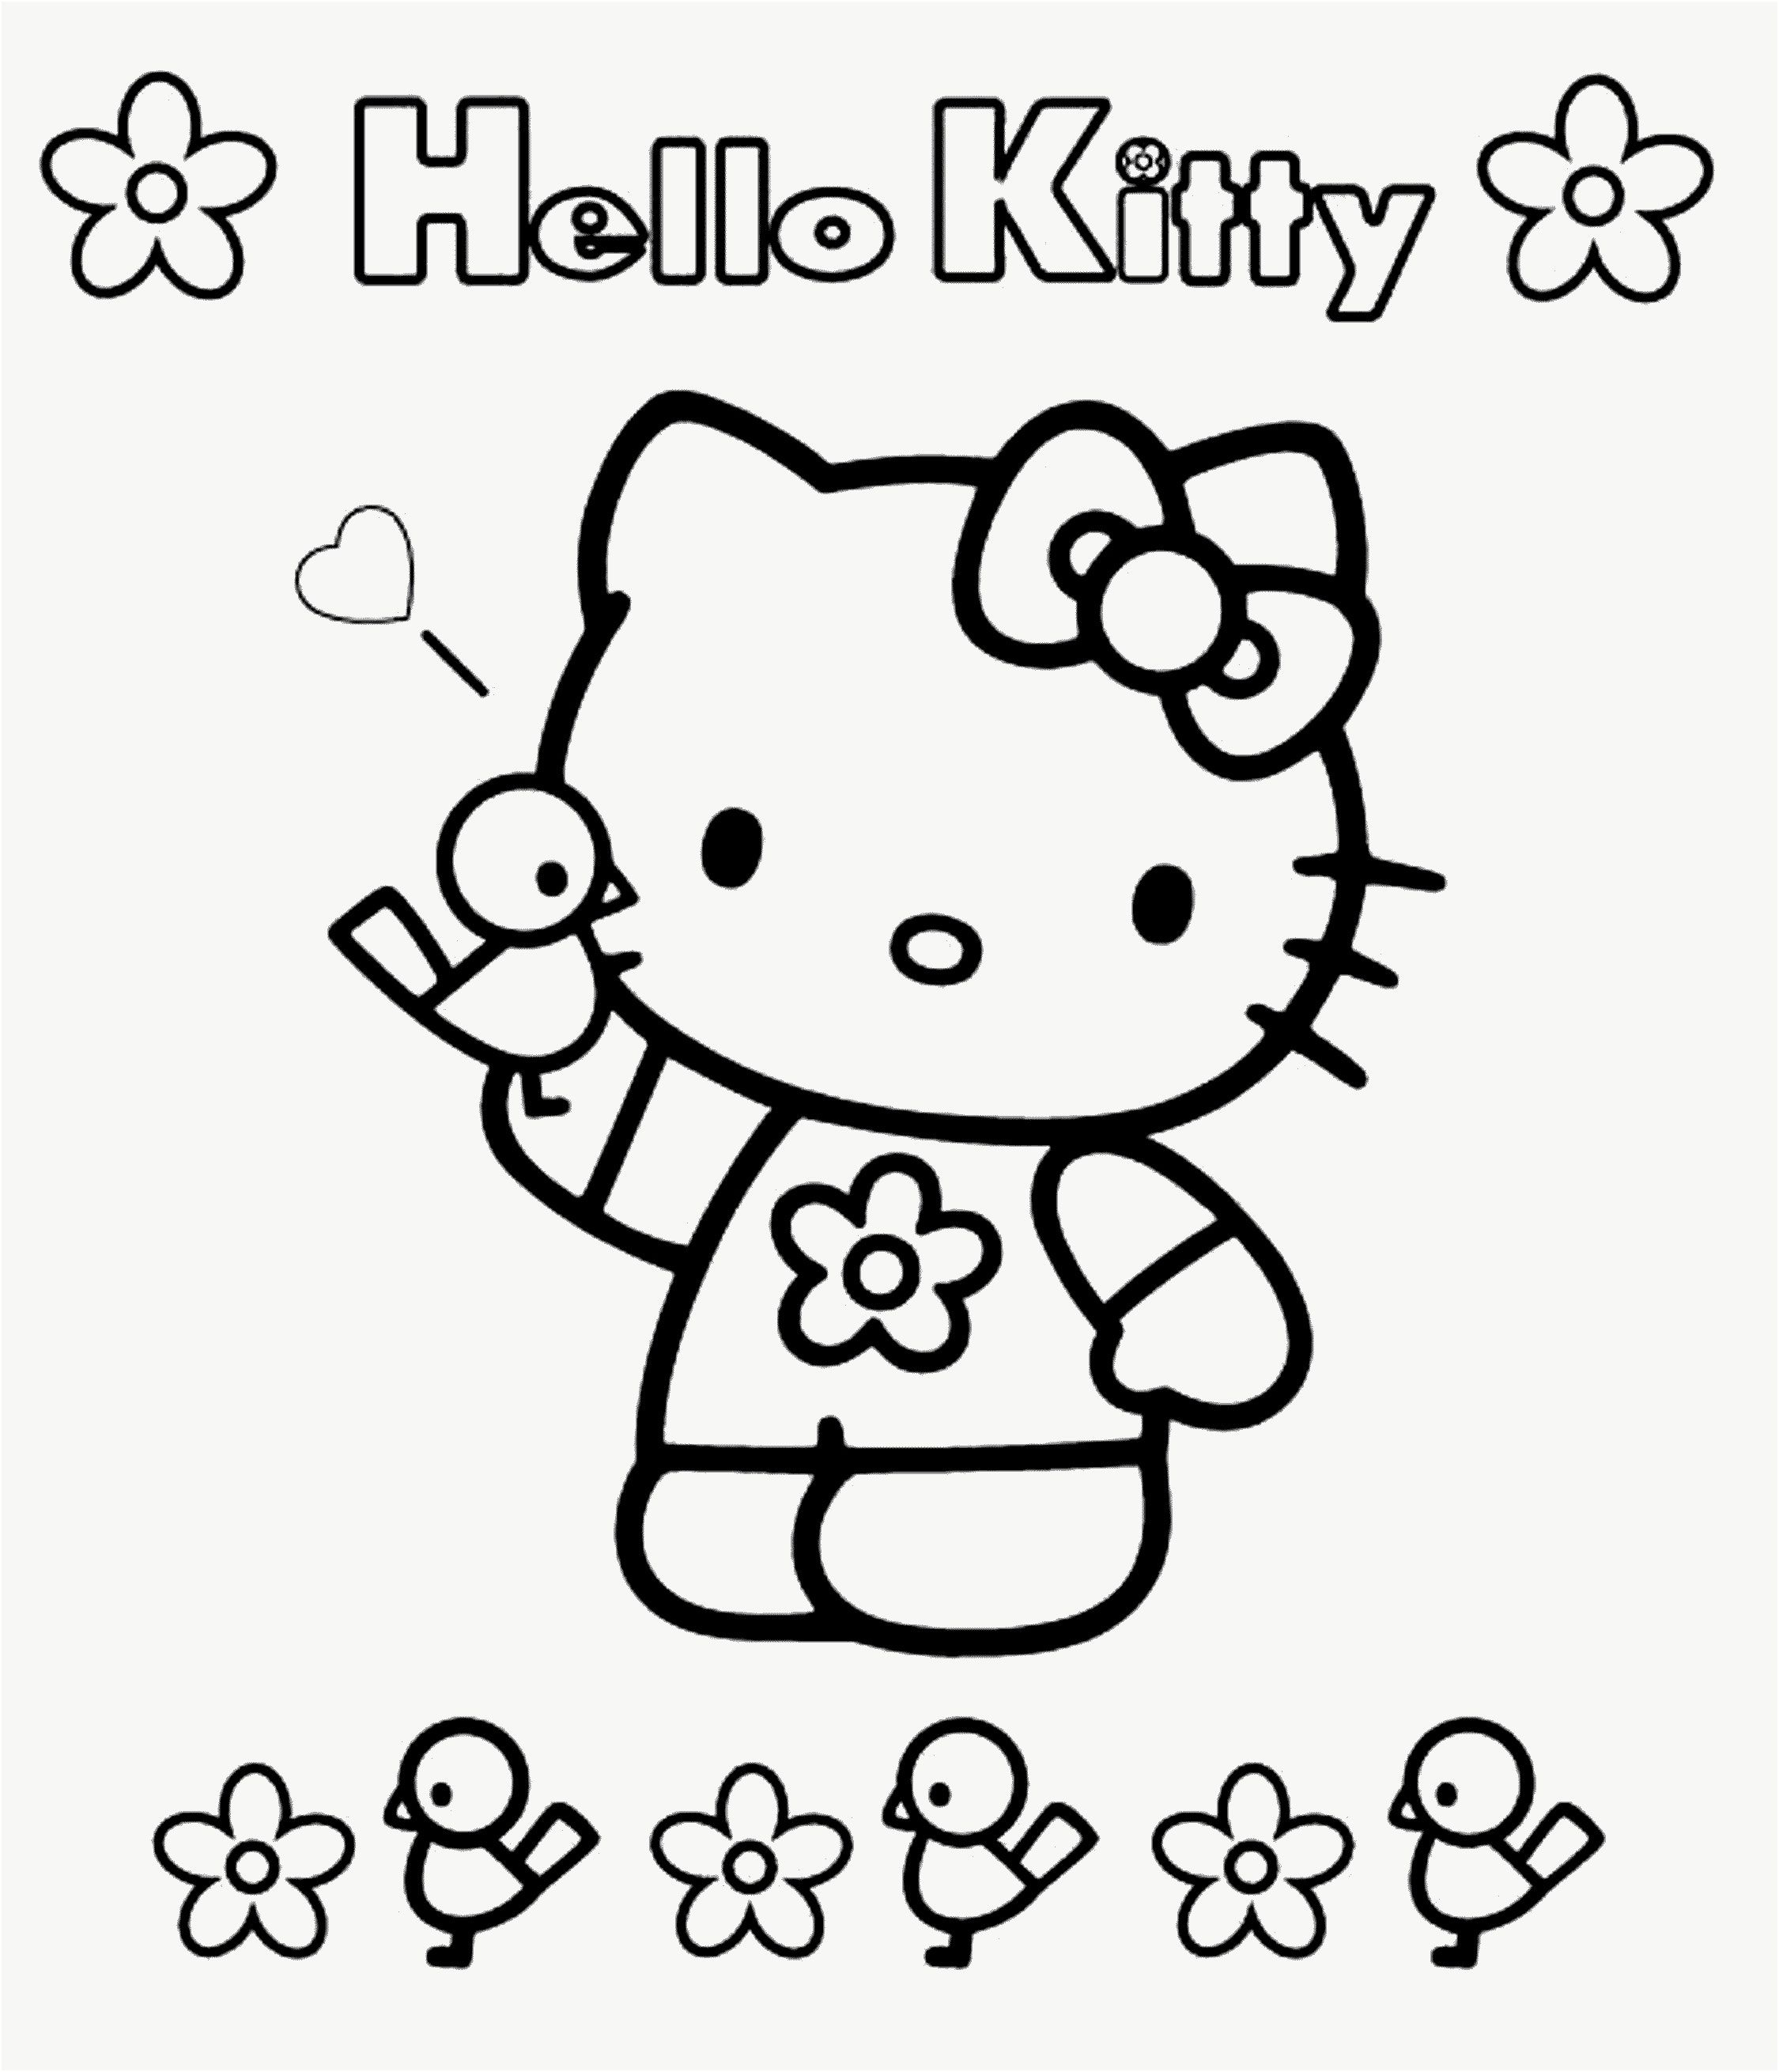 288 Génial Coloriage Enfant 28 Ans Image  Hello kitty coloring